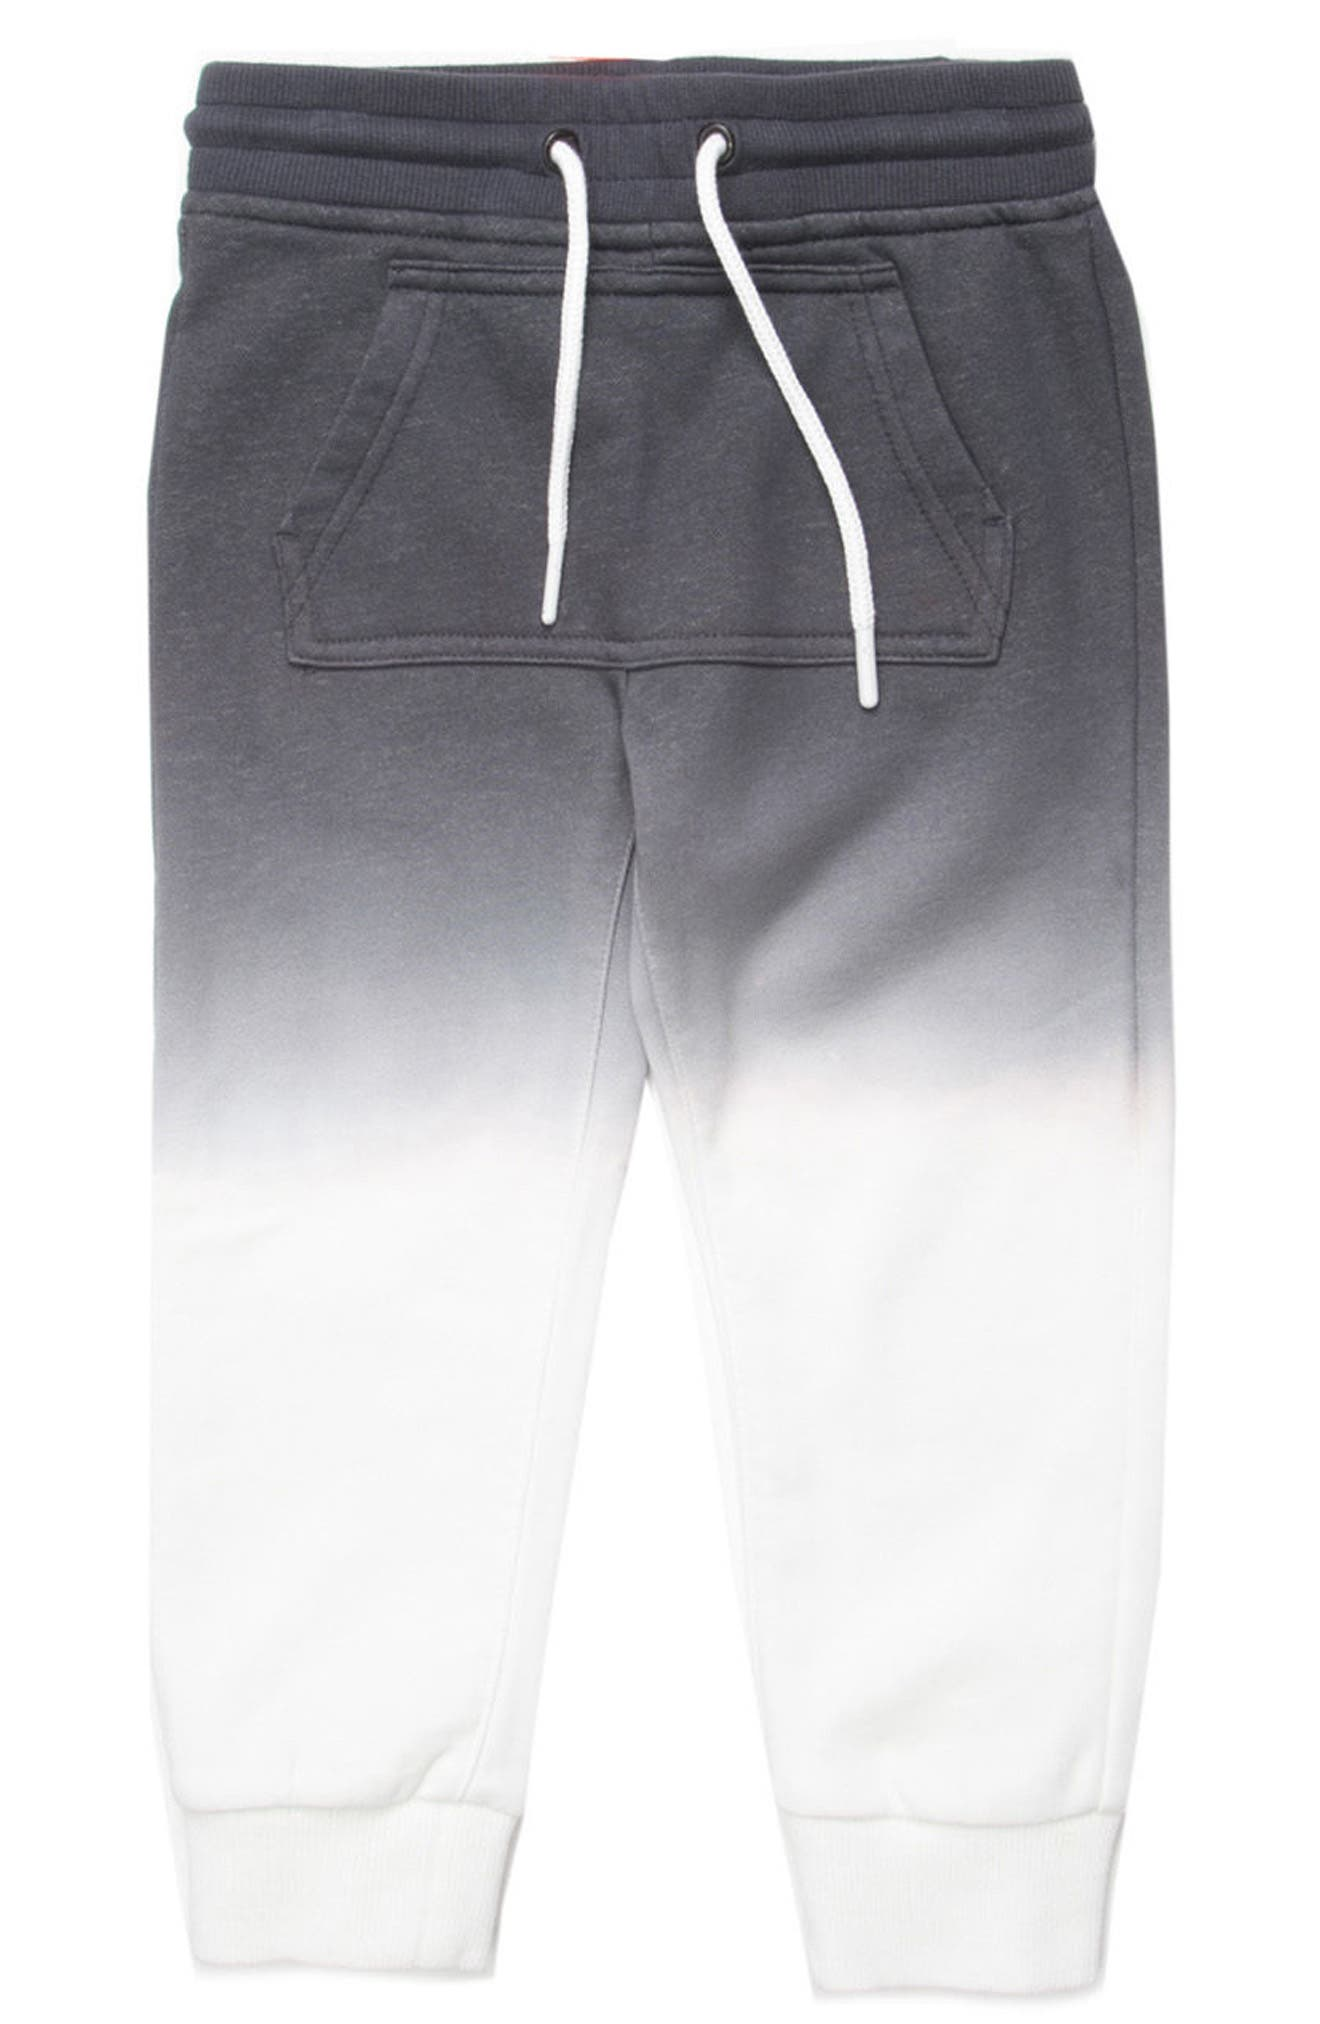 079482b00f Kids' SUPERISM Apparel: T-Shirts, Jeans, Pants & Hoodies | Nordstrom